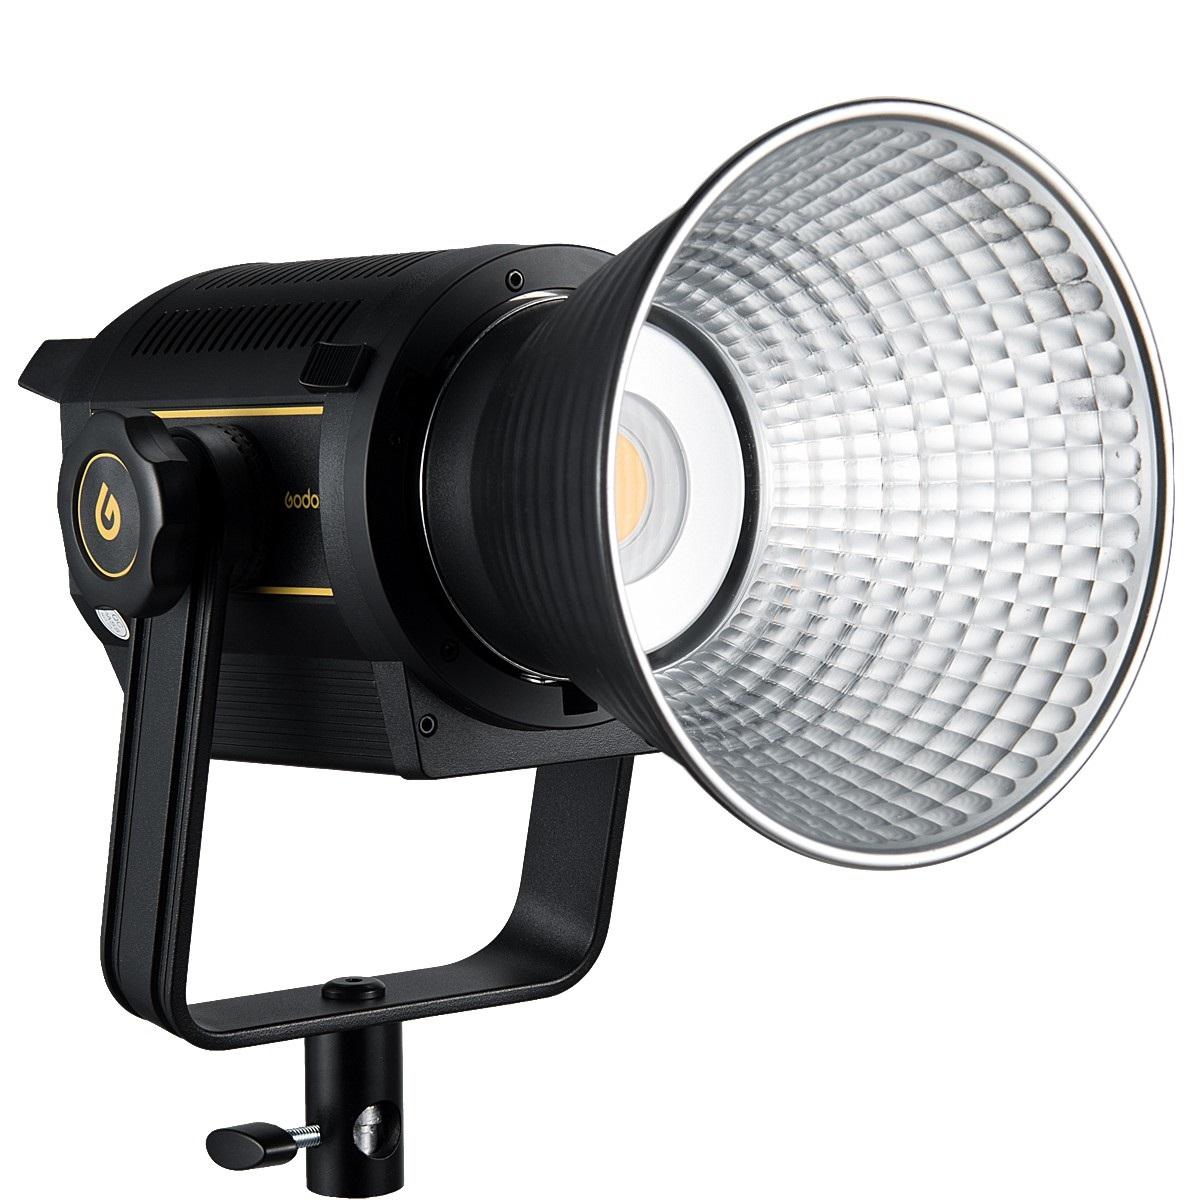 Godox VL150 professionelle LED Leuchte Serie VL